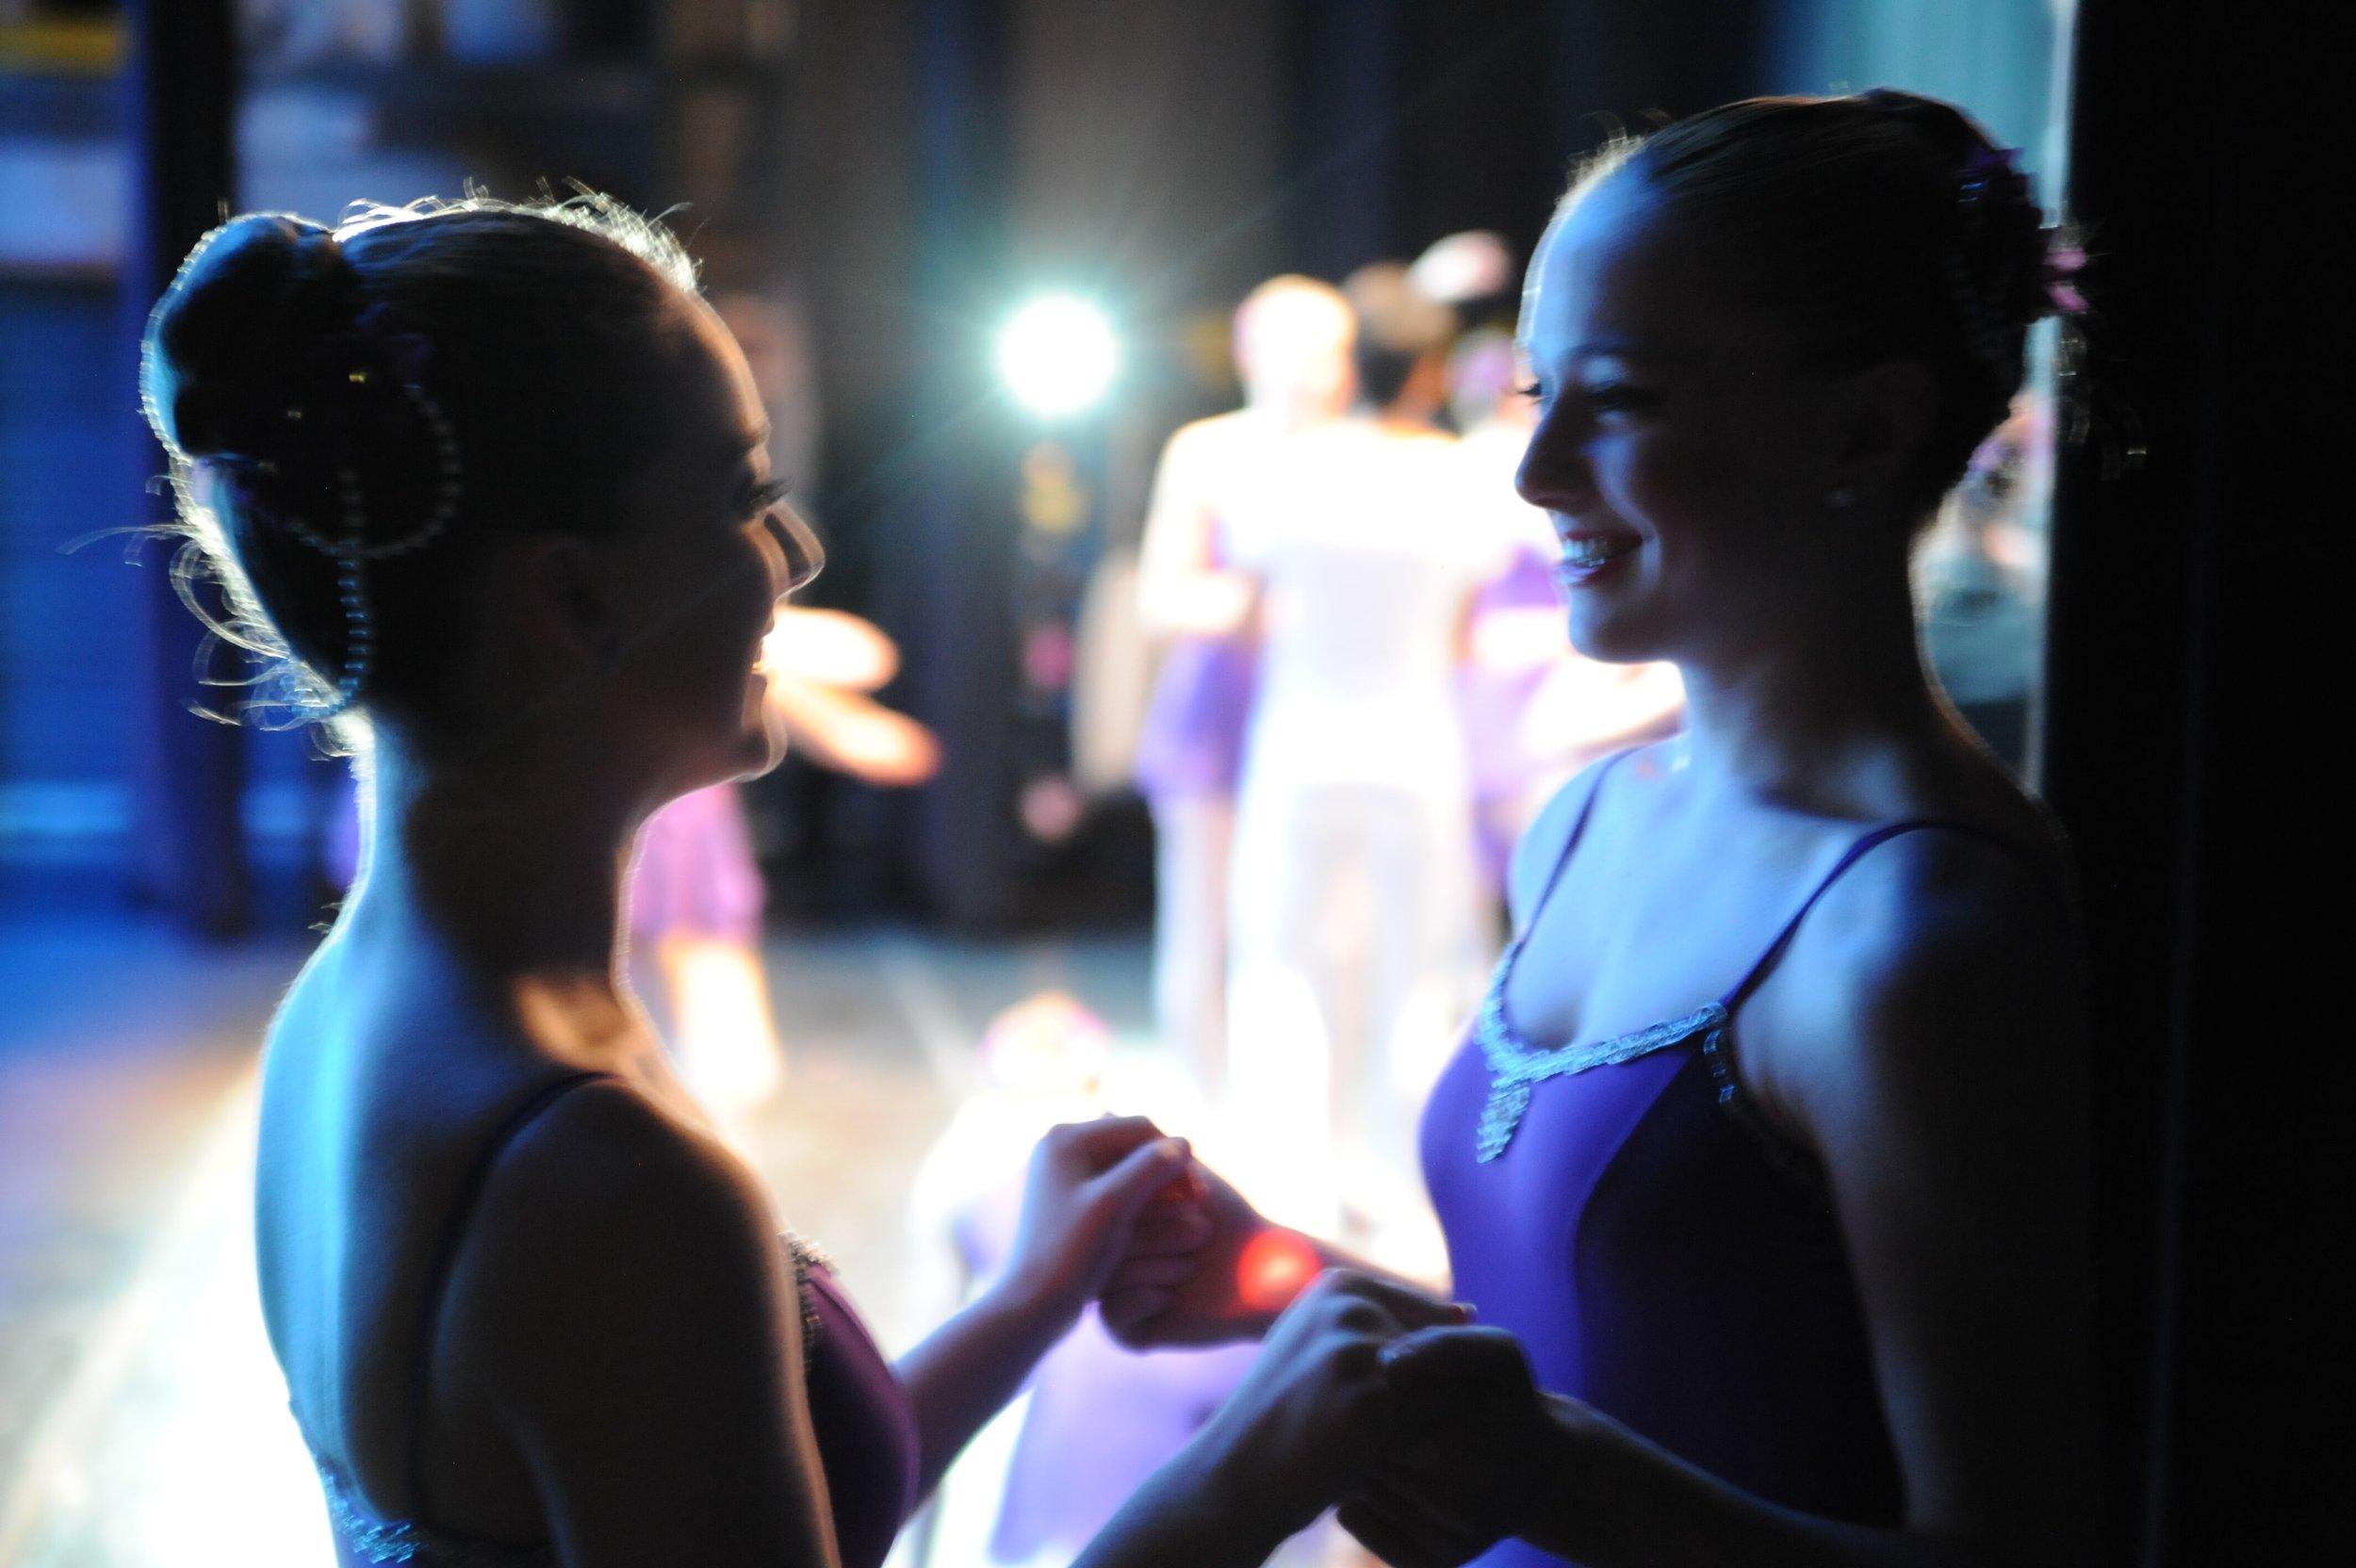 Megan Meehan and Megan McDonald Dancers Backstage